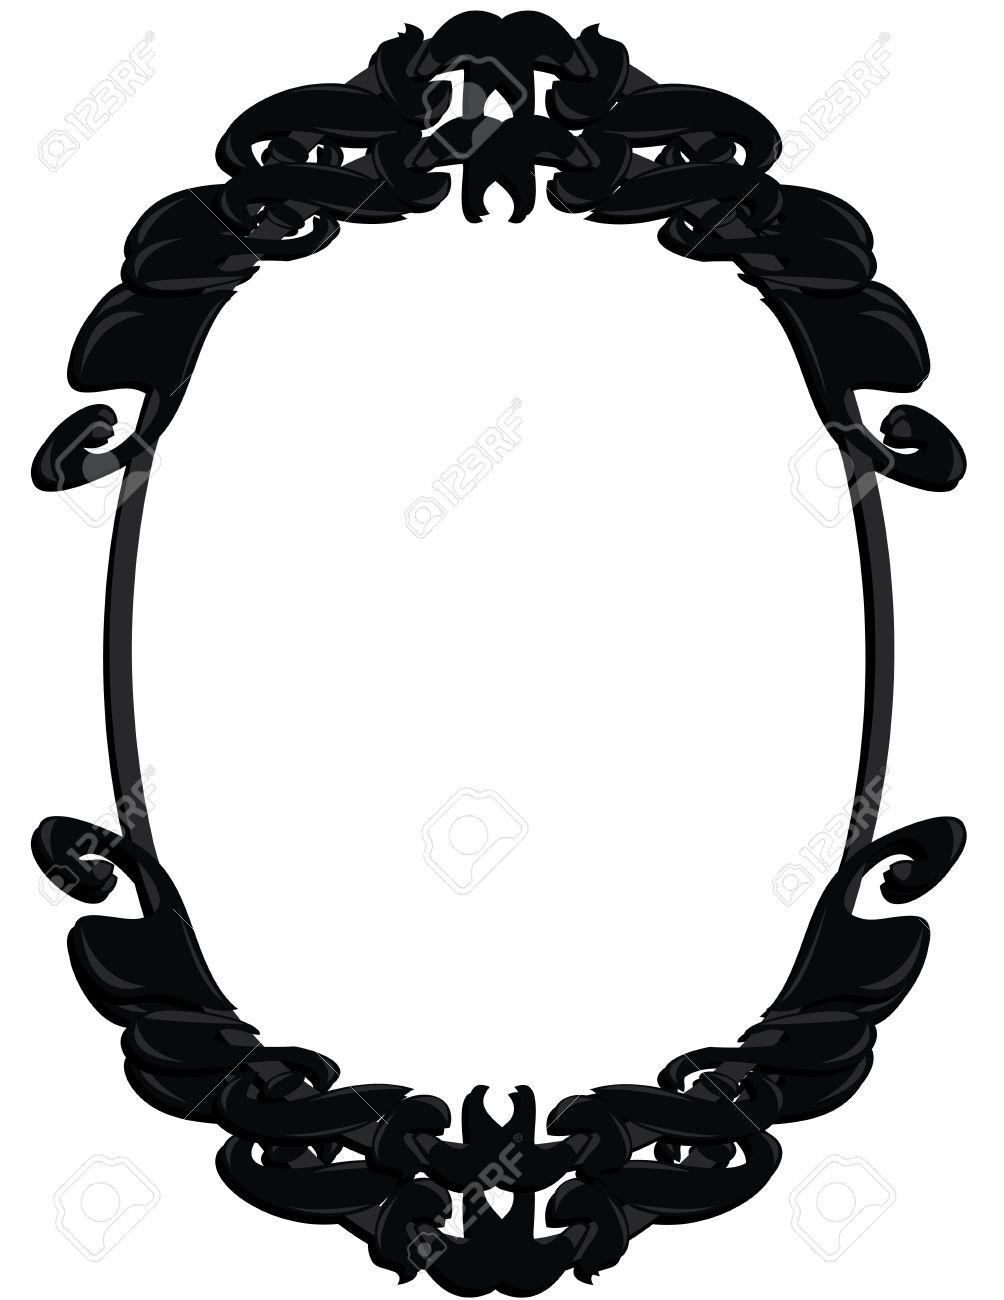 Black, gray, and white frame design element Stock Vector - 7315104